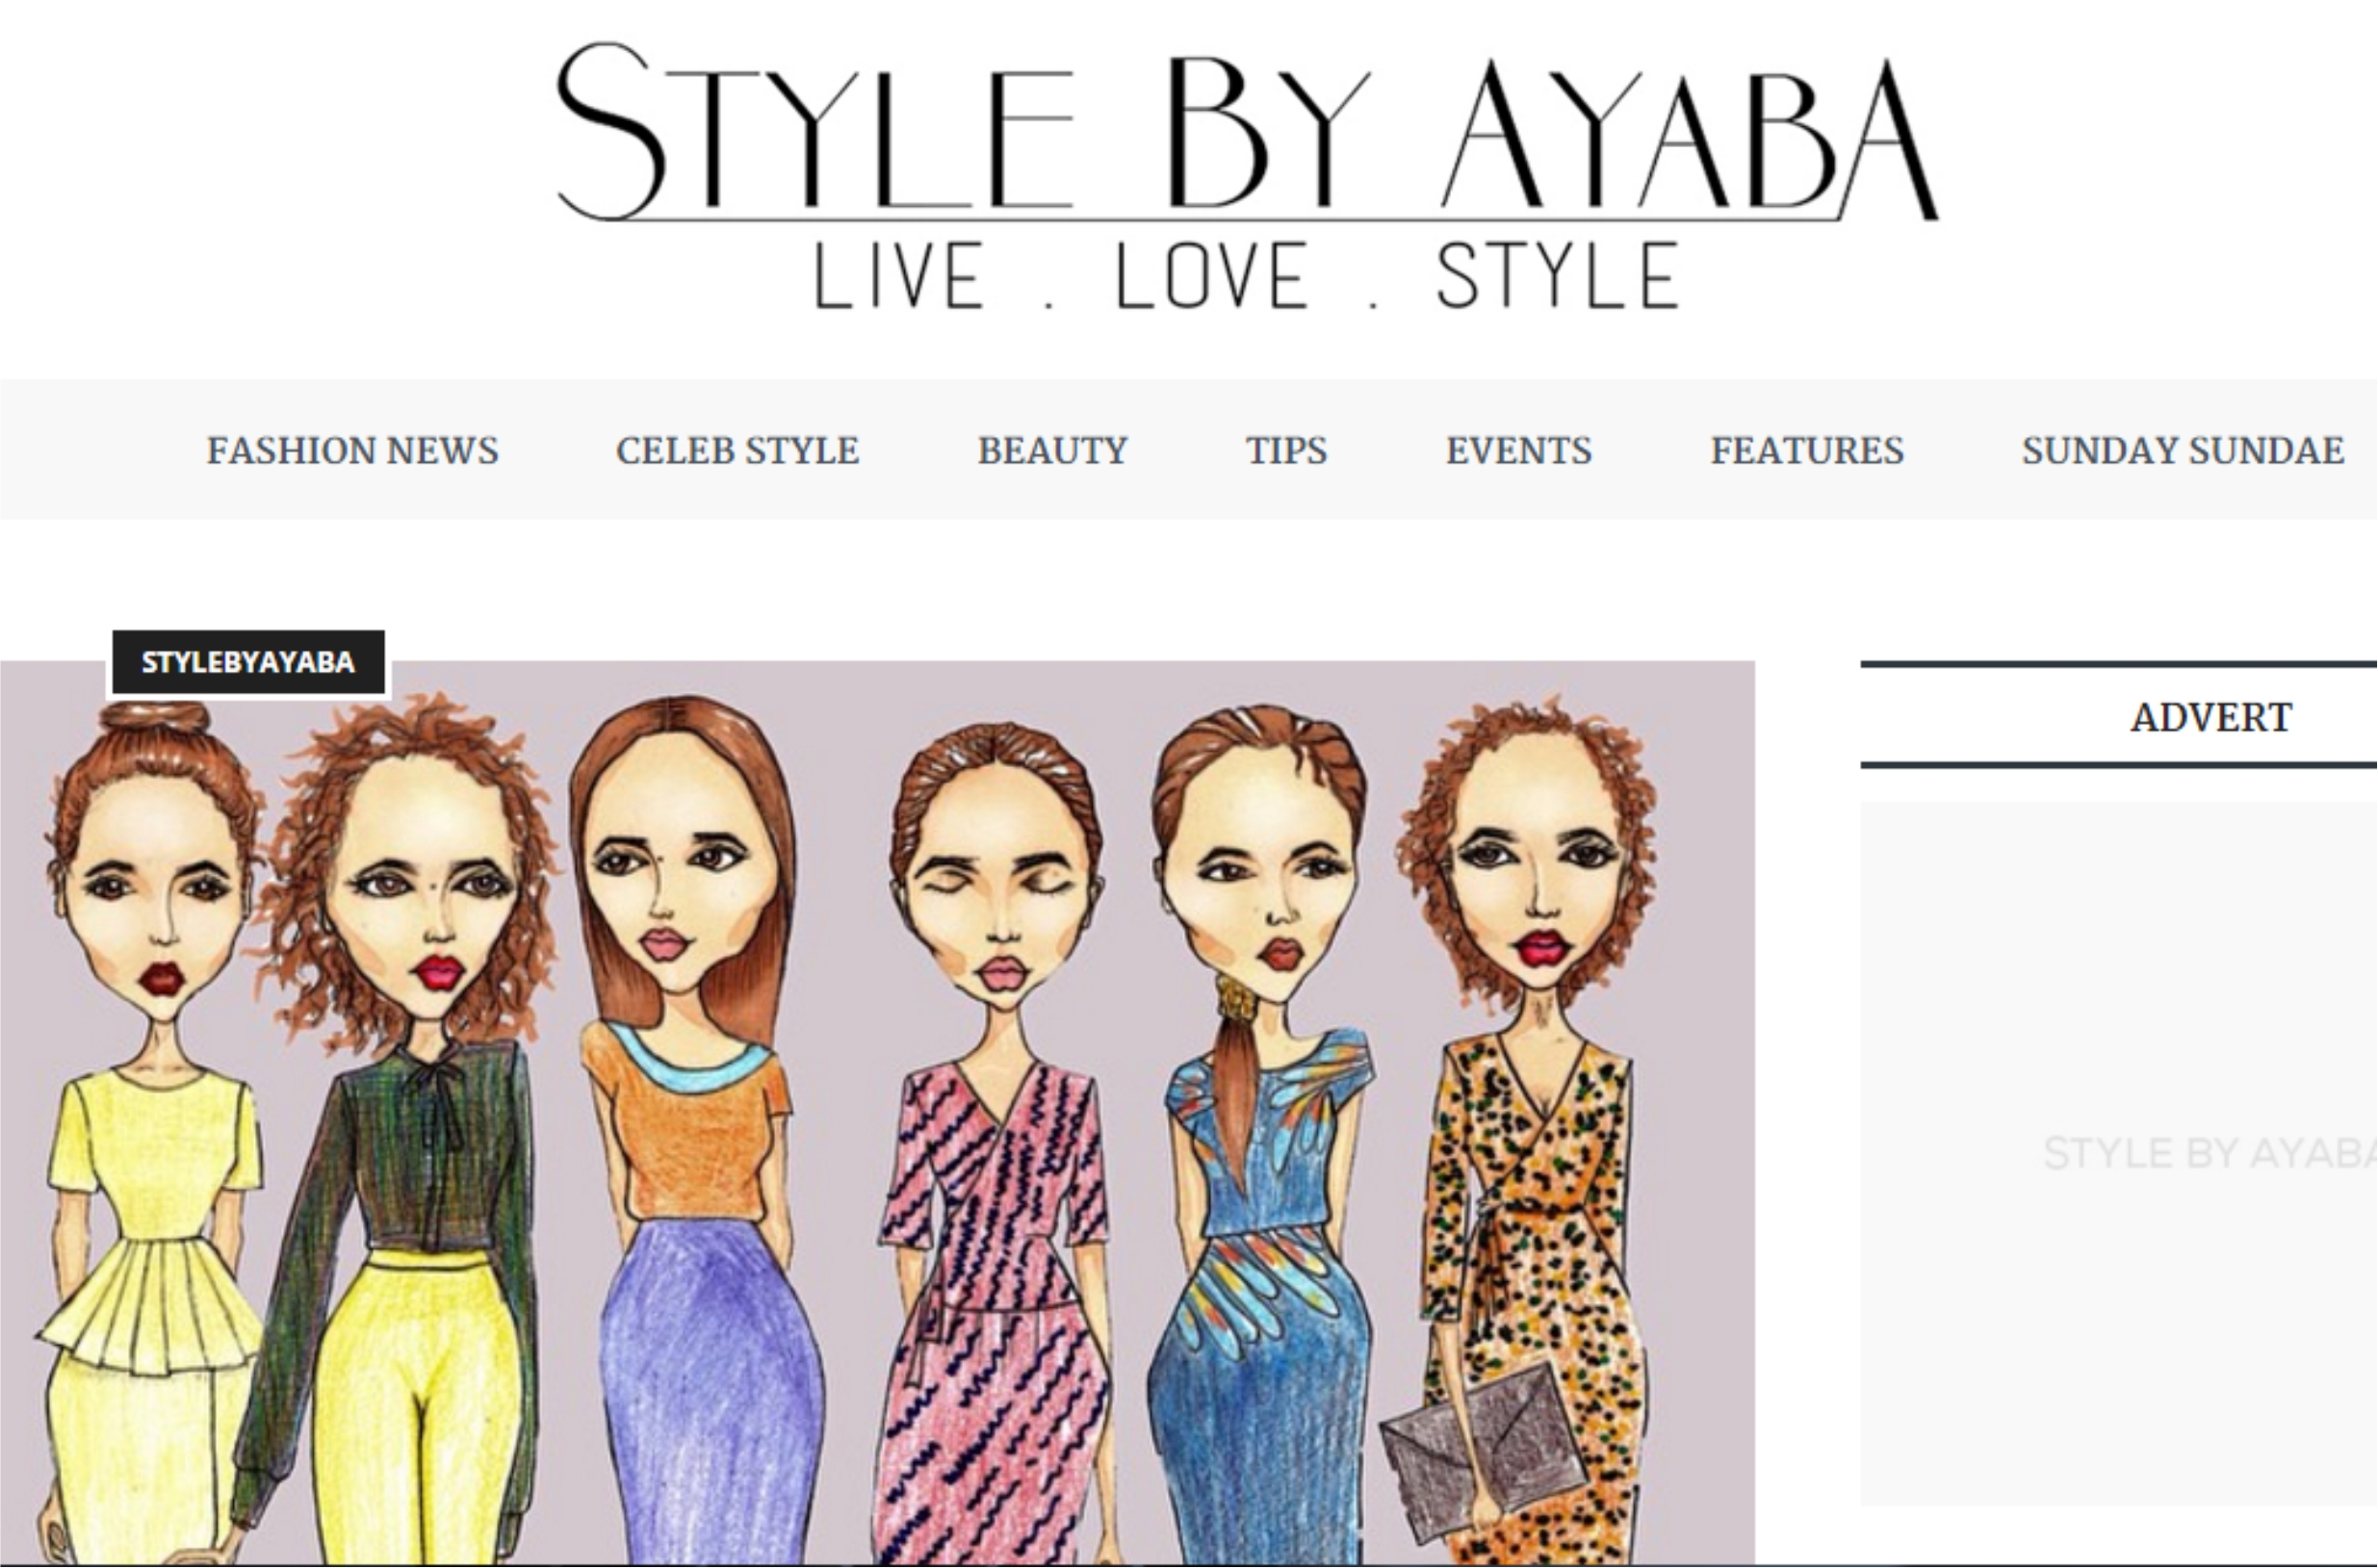 STYLE BY AYABA